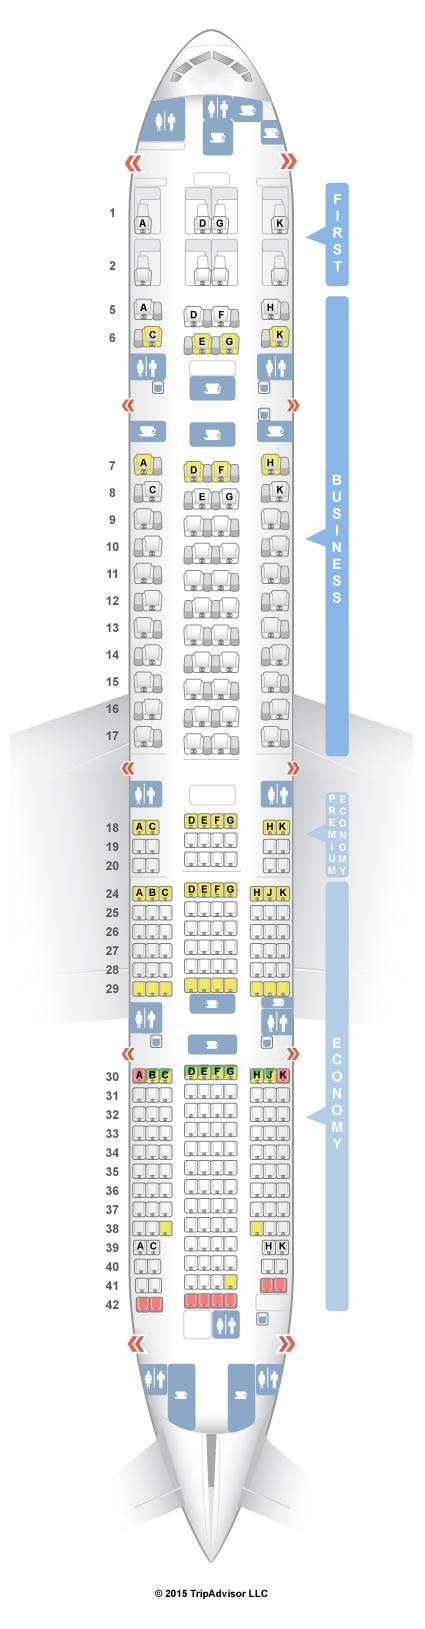 SeatGuru Seat Map ANA Boeing 777-300ER (77W) V4